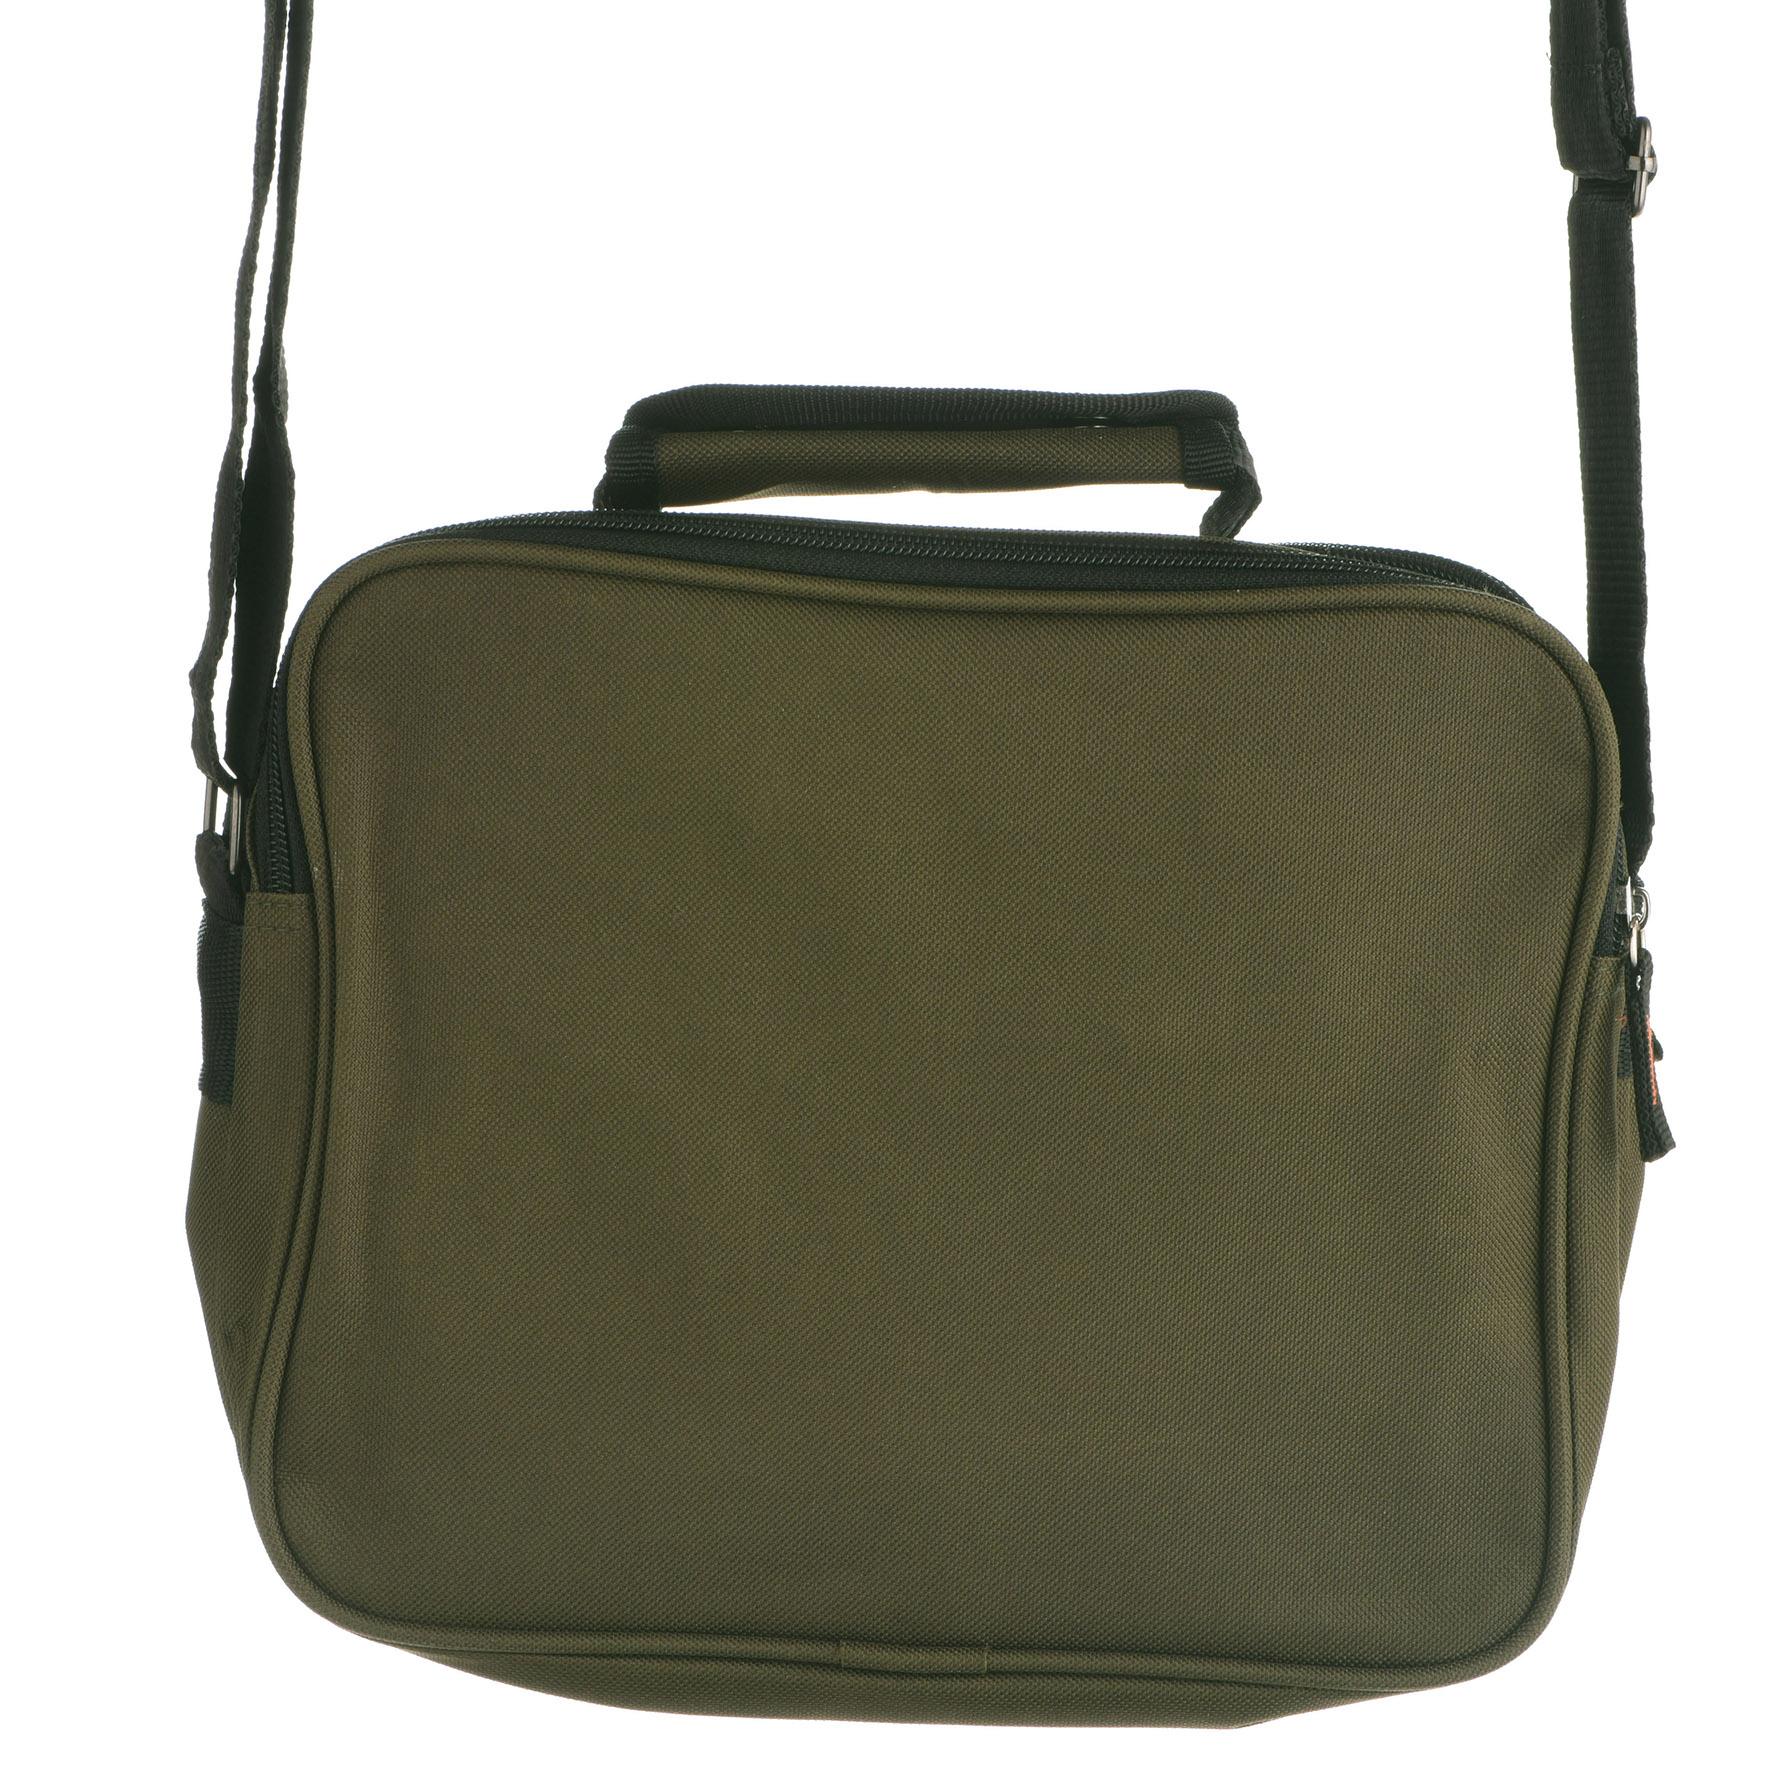 Canvas Multi-Functional Travel Camera Shoulder Bag with Grab Handle Black Green